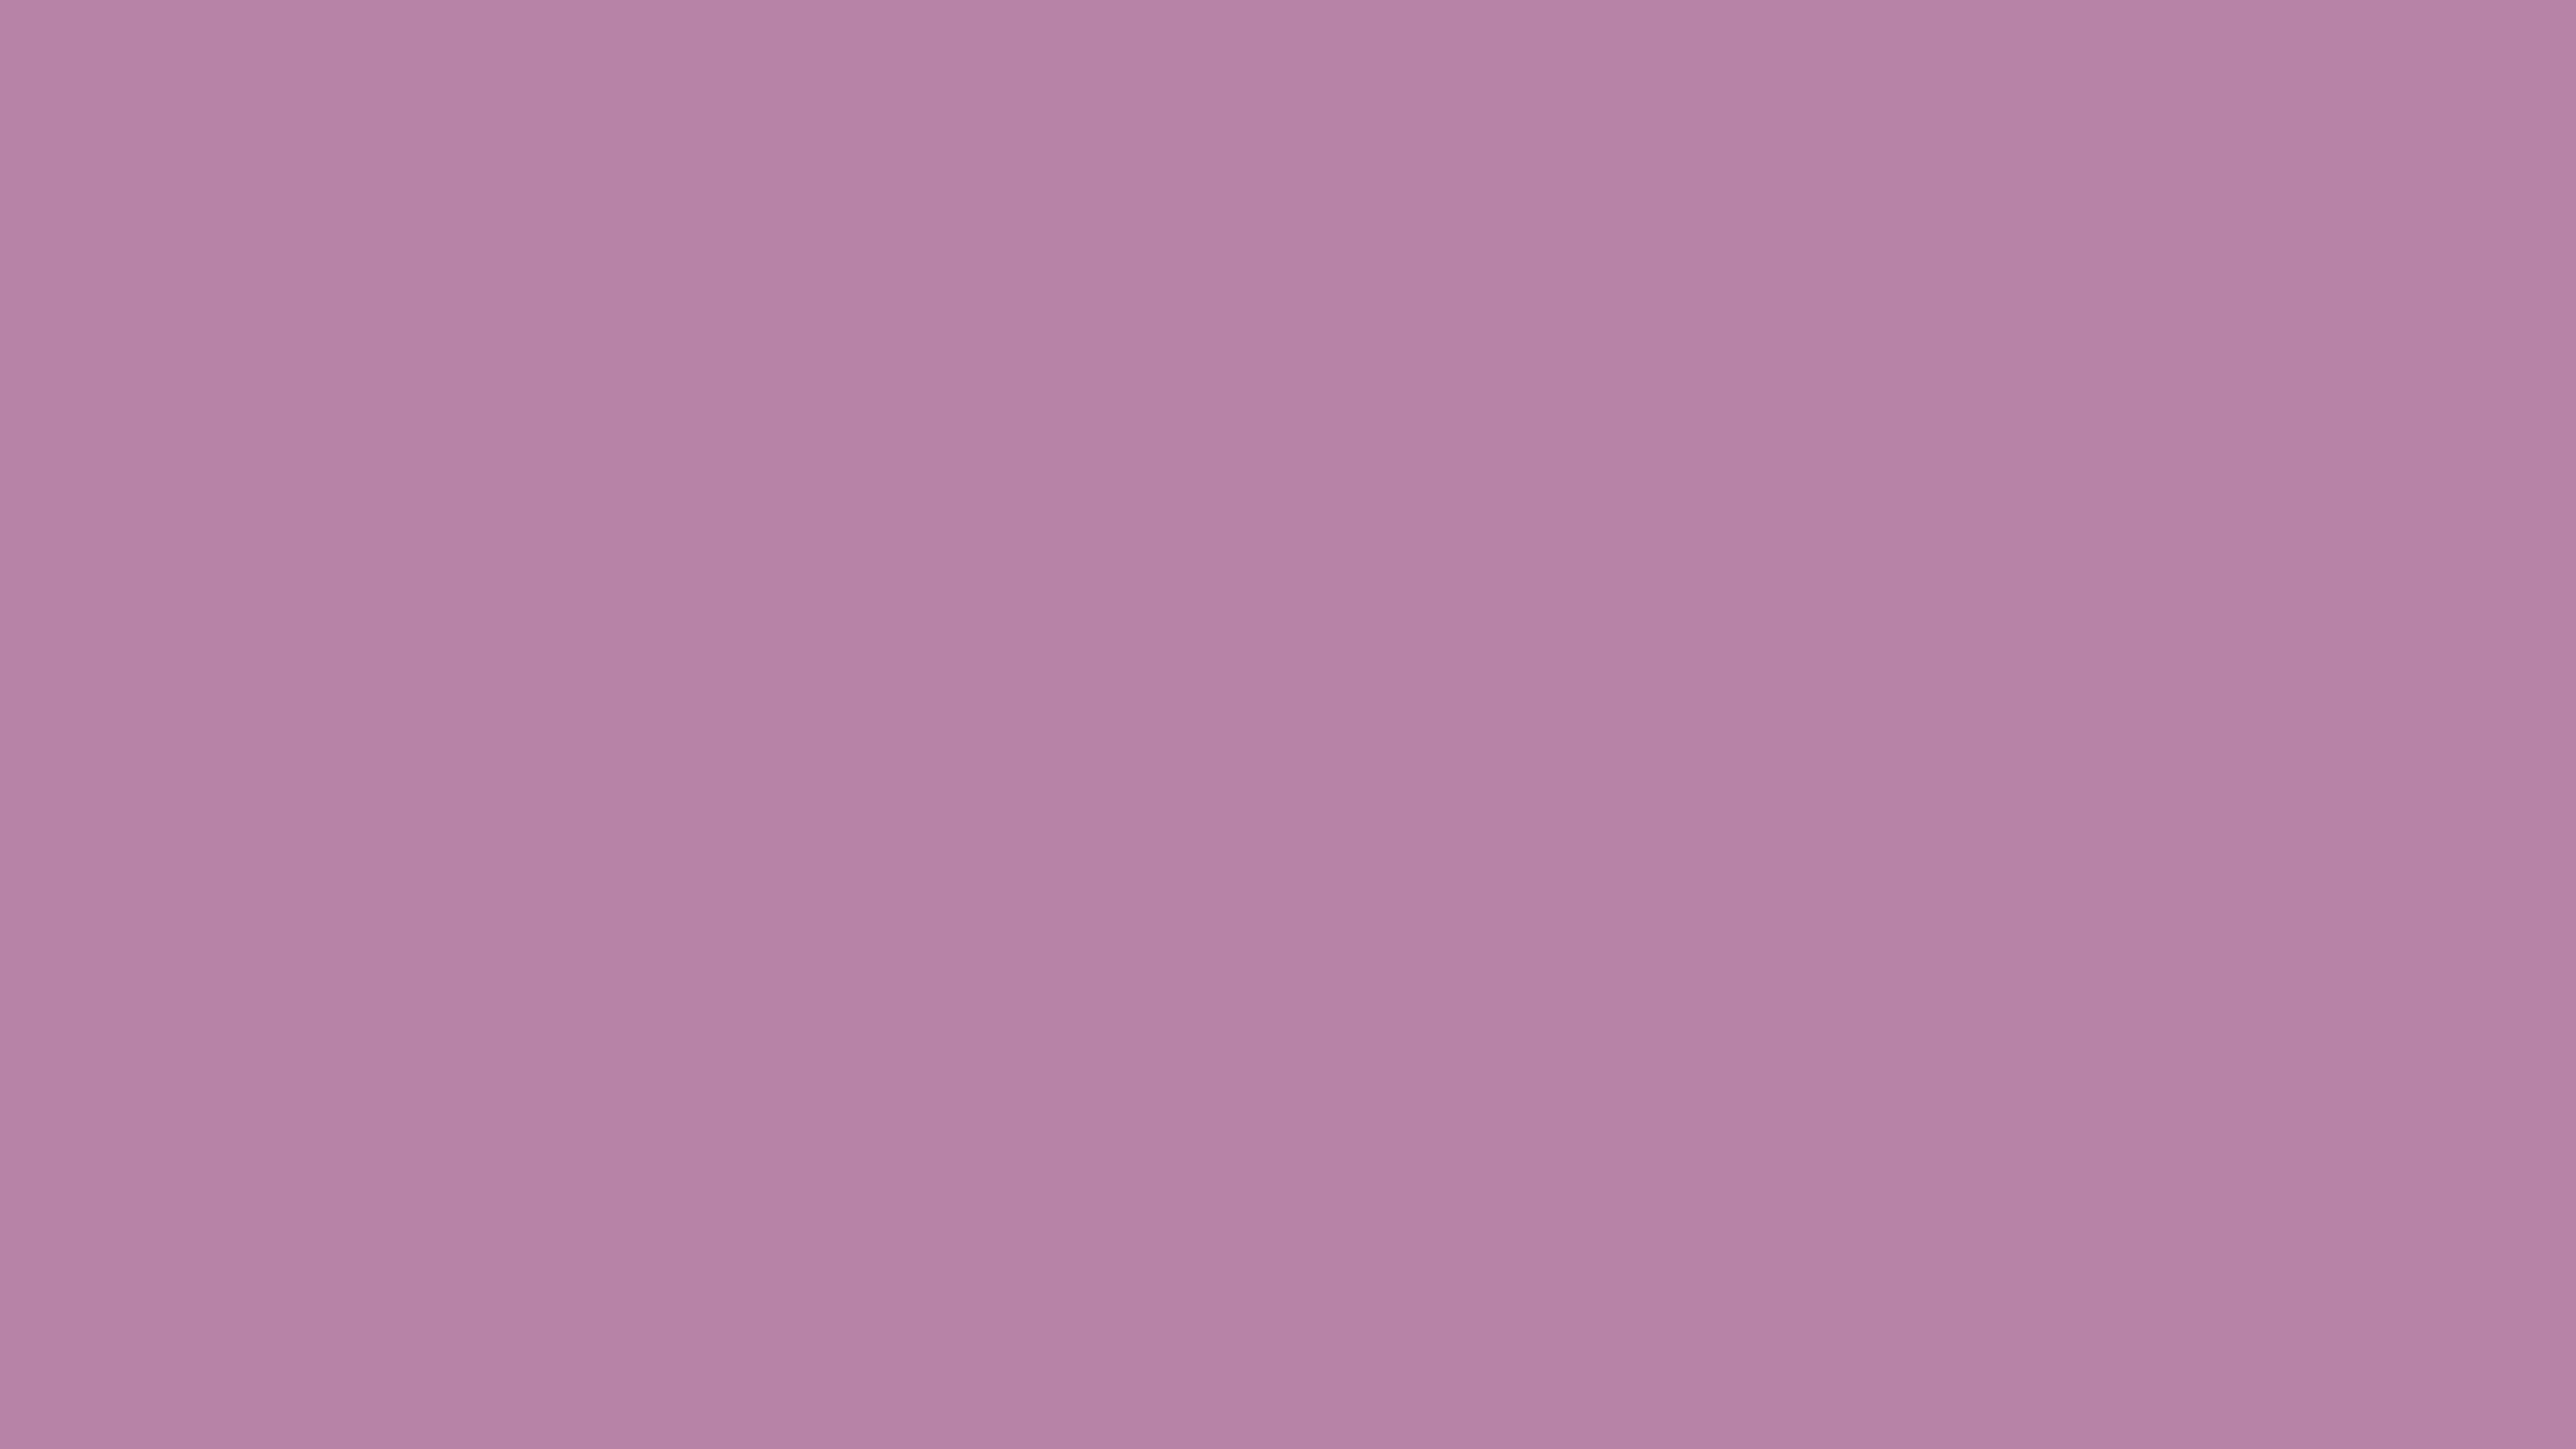 3840x2160 Opera Mauve Solid Color Background